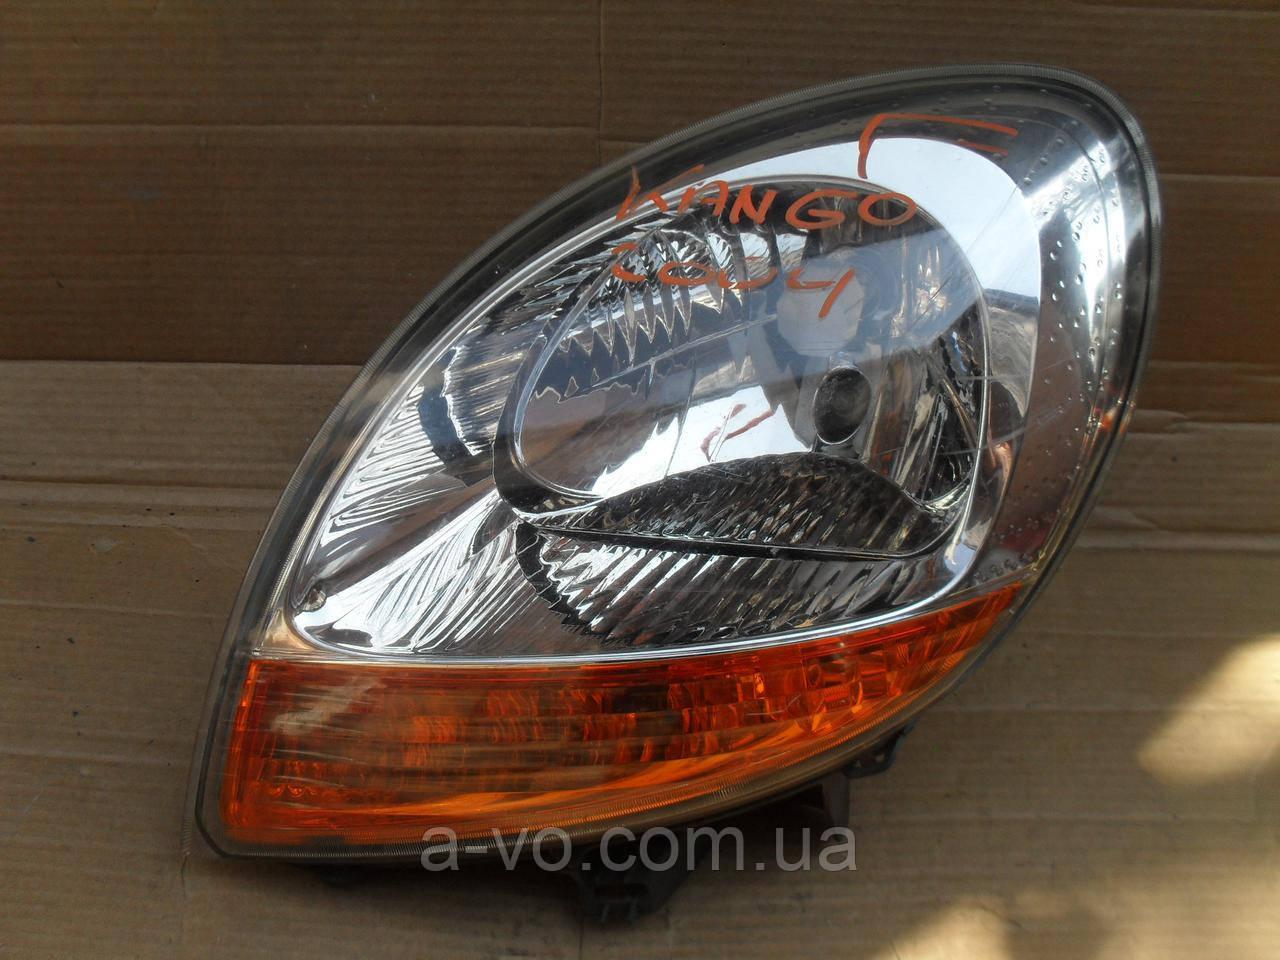 Фара основная левая для Renault Kangoo 1, (2003-2005) Valeo 8200150614, 89008437, 89008681, 89009621